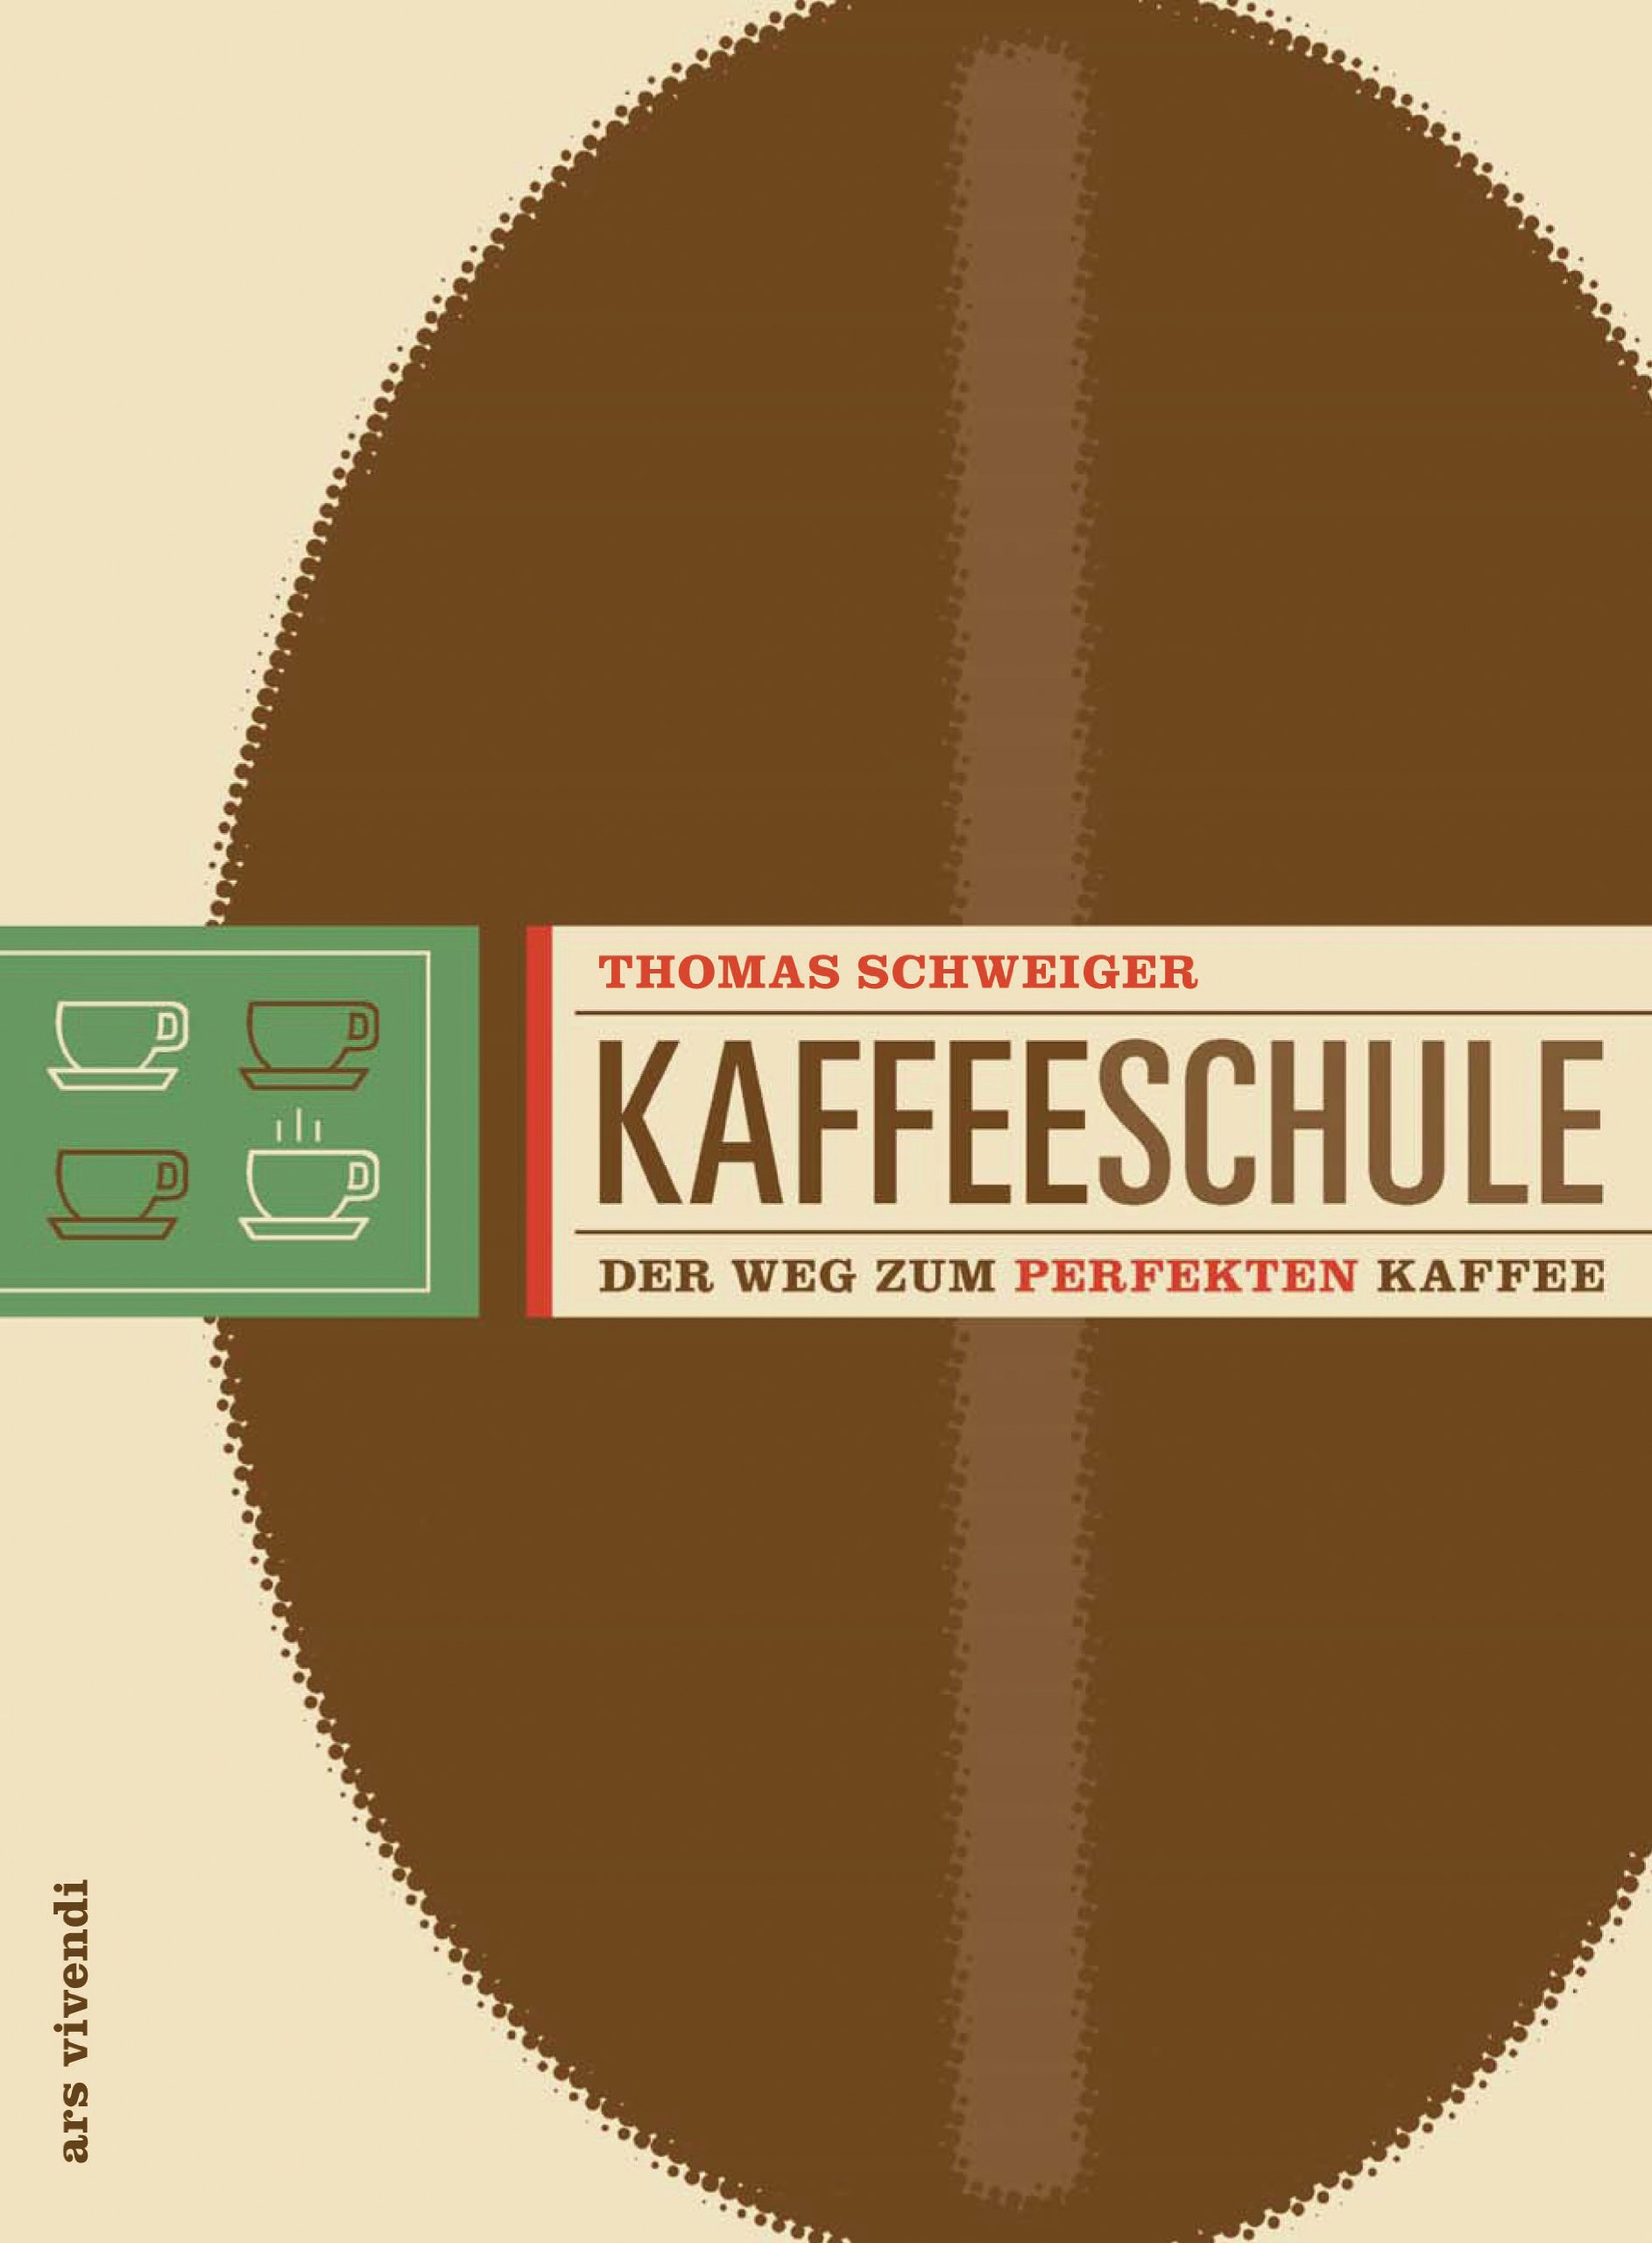 Kaffeeschule Gebundenes Buch – 1. Dezember 2008 Thomas Schweiger Ars Vivendi 3897169177 Getränke